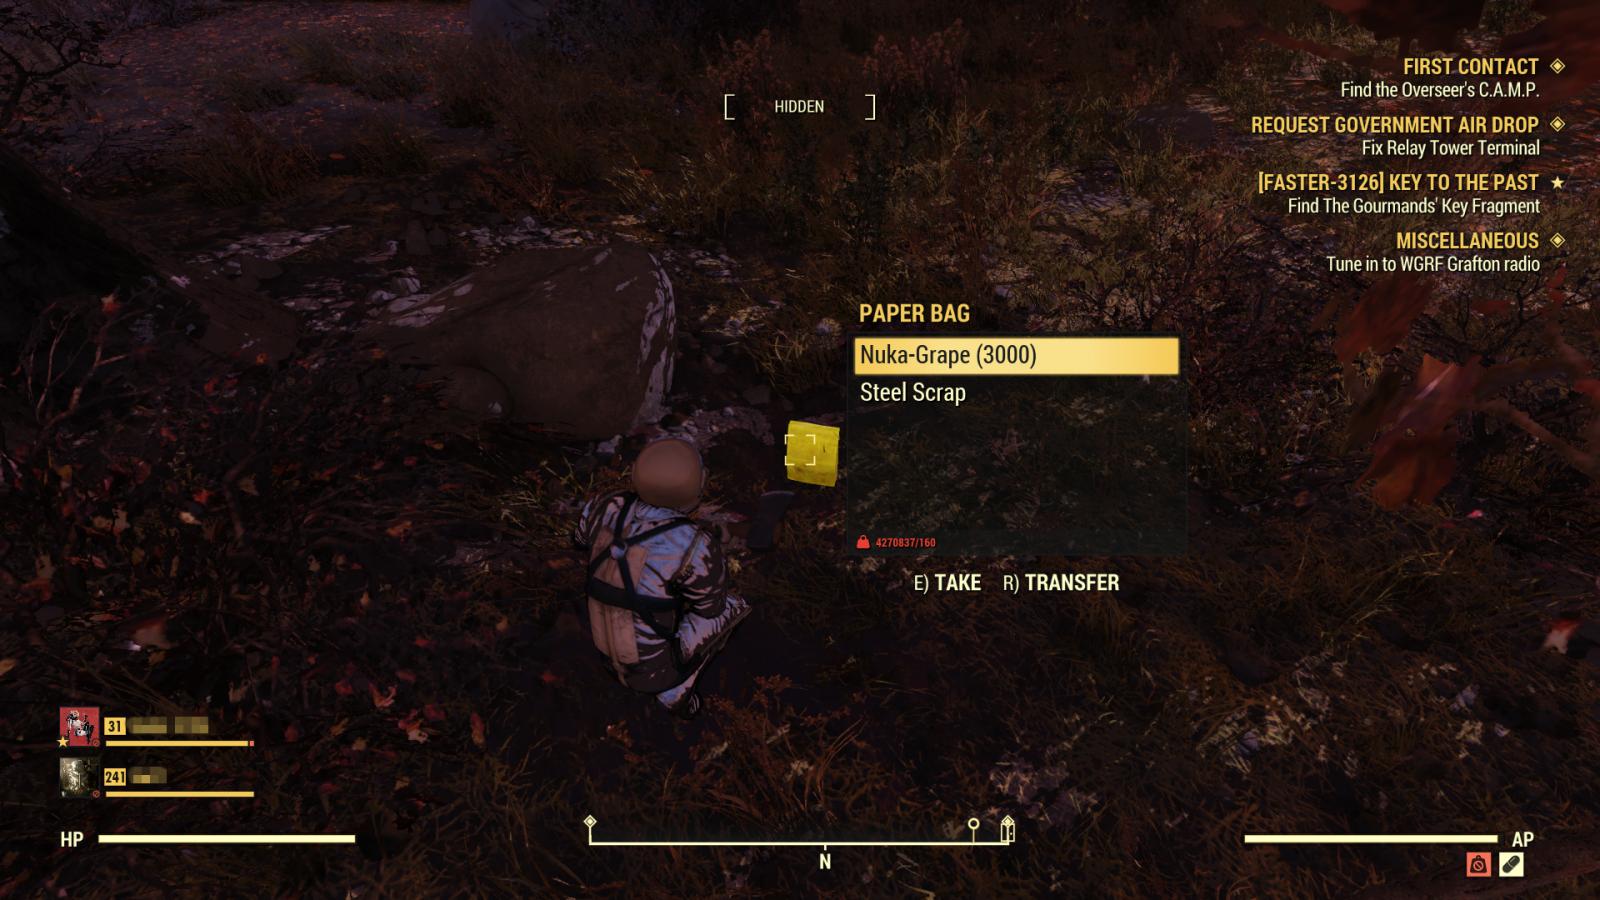 Fallout 76 Bottle Caps, Buy Cheap FO76 Caps, Fallout 76